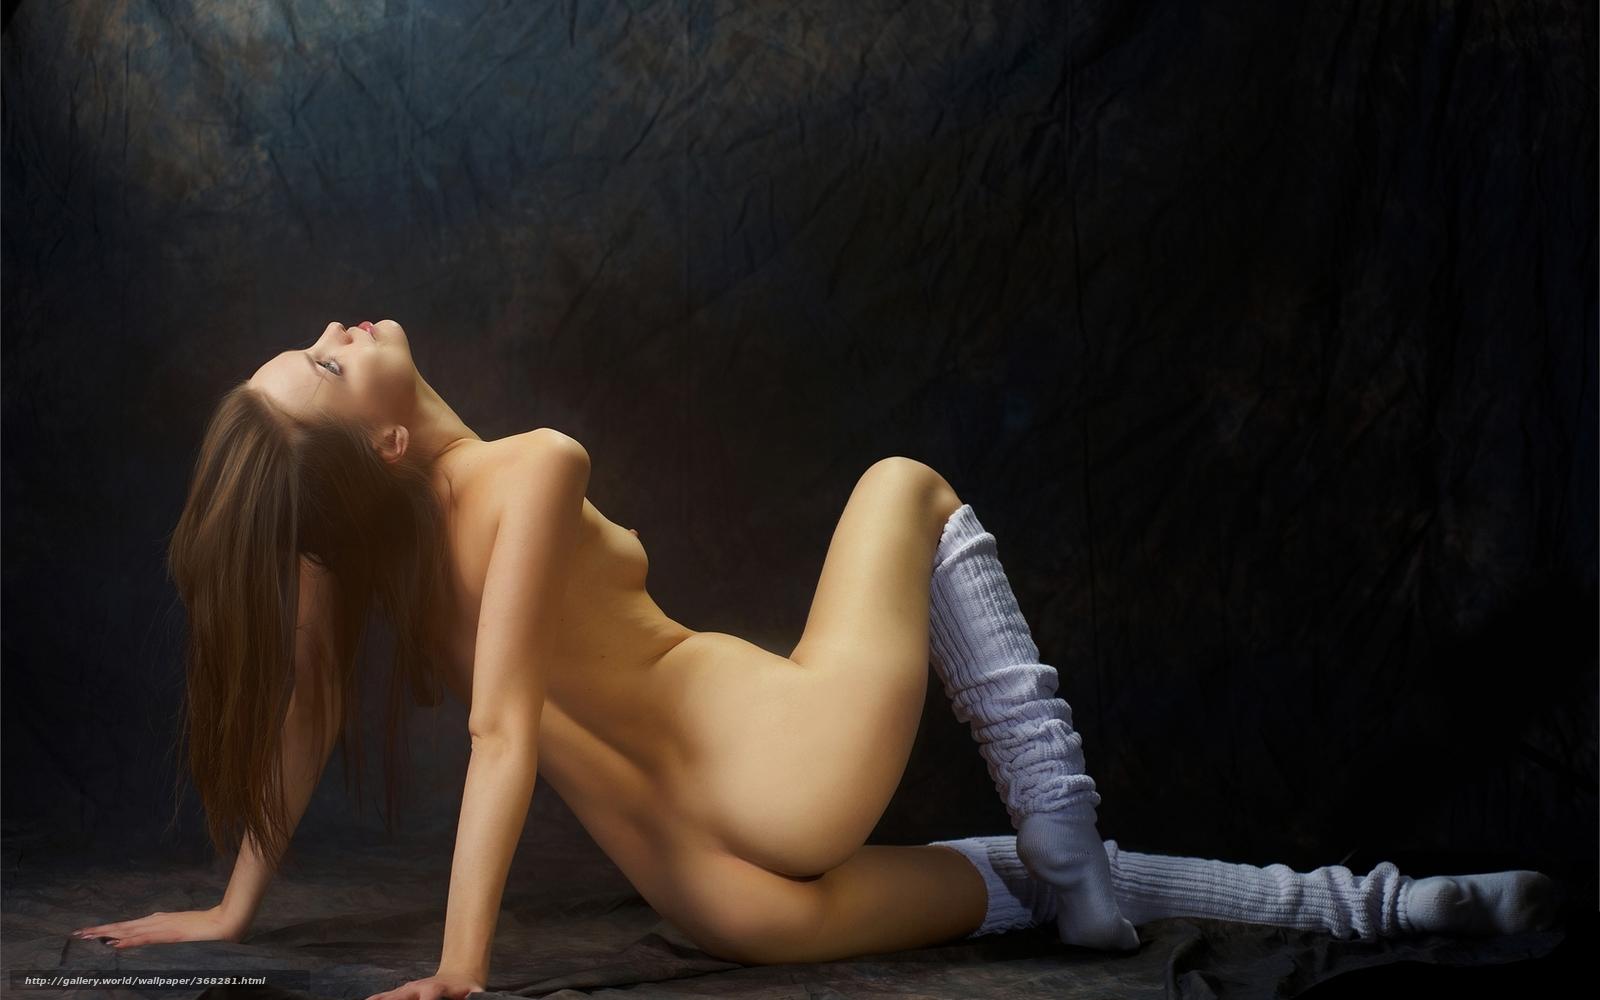 krasivie-figuri-devushek-seks-video